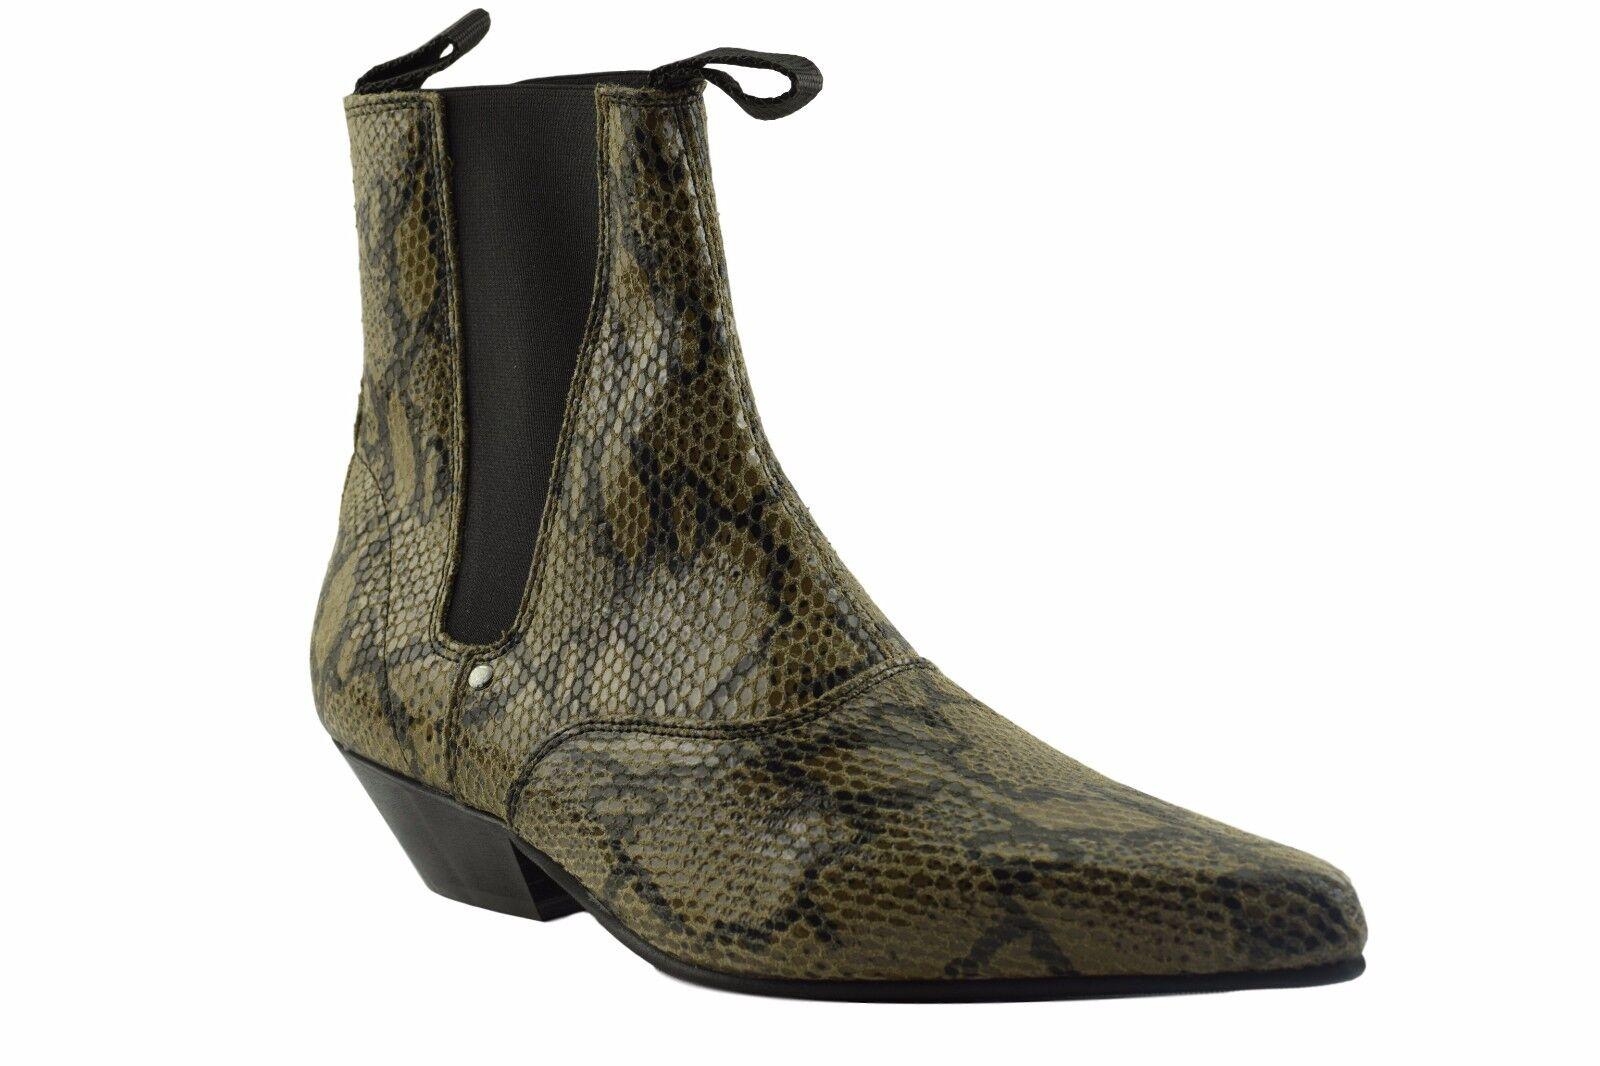 Terra in Acciaio Stivali Chelsea Pelle in Pelle Marrone Pitone Pelle Chelsea Look Tacco Cubano BEAT Boot 886384